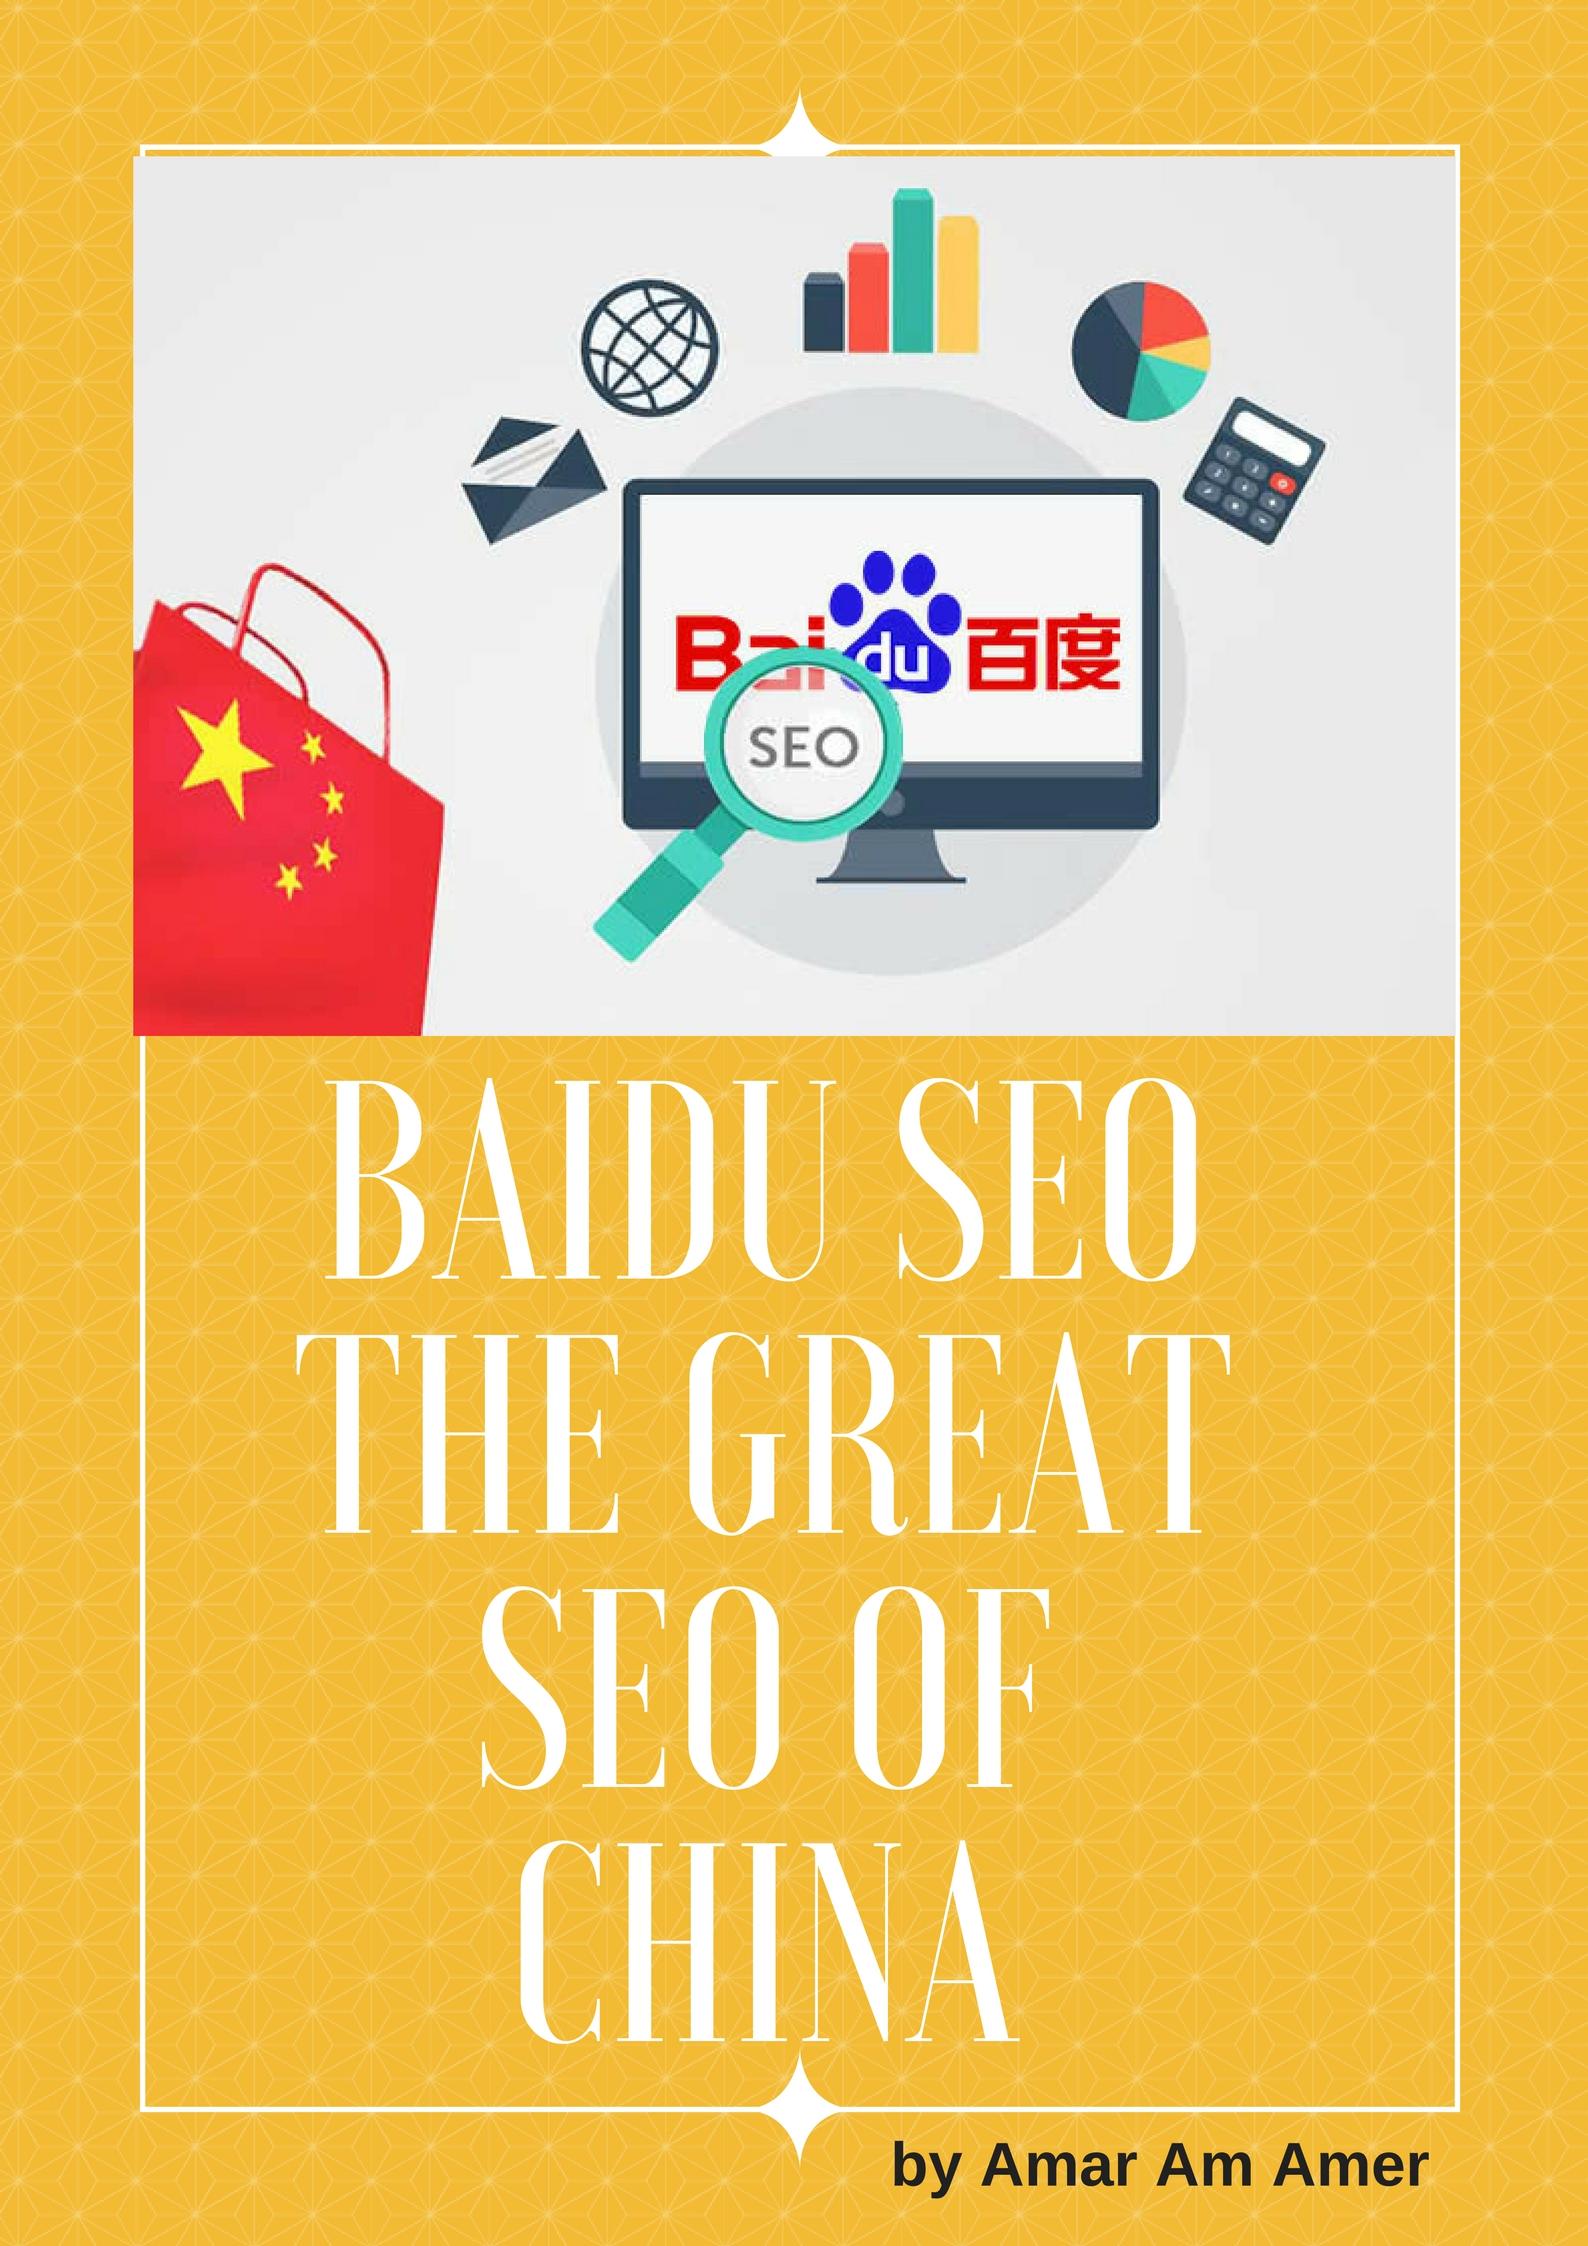 Baidu SEO: The Great seo of China